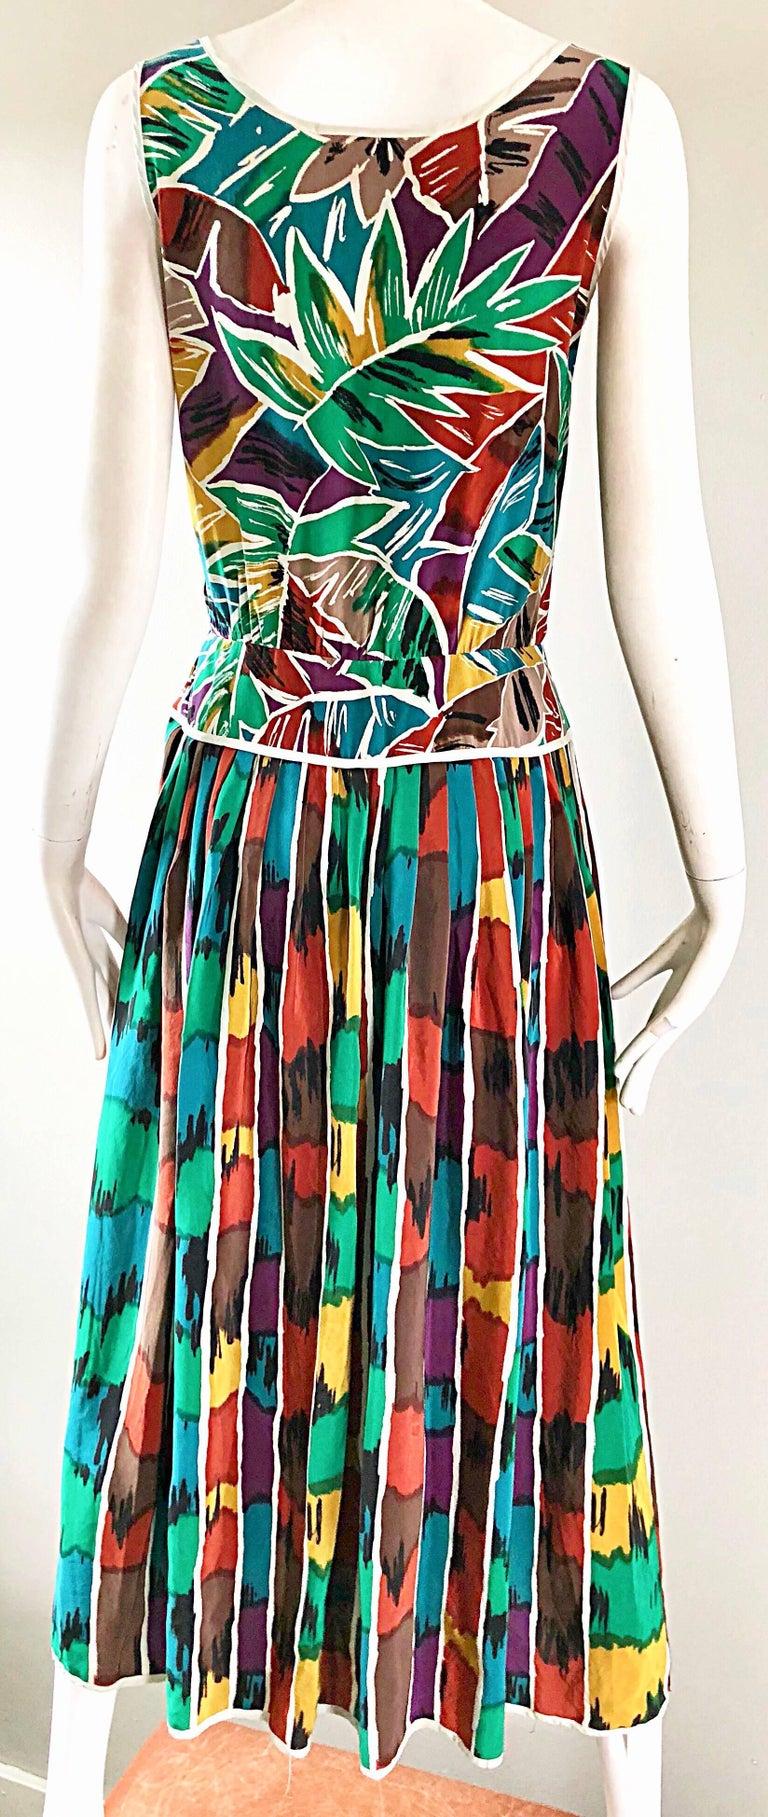 Vintage Oscar de la Renta Size 8 / 10 Kaleidoscope Print Silk Sleeveless Dress For Sale 6